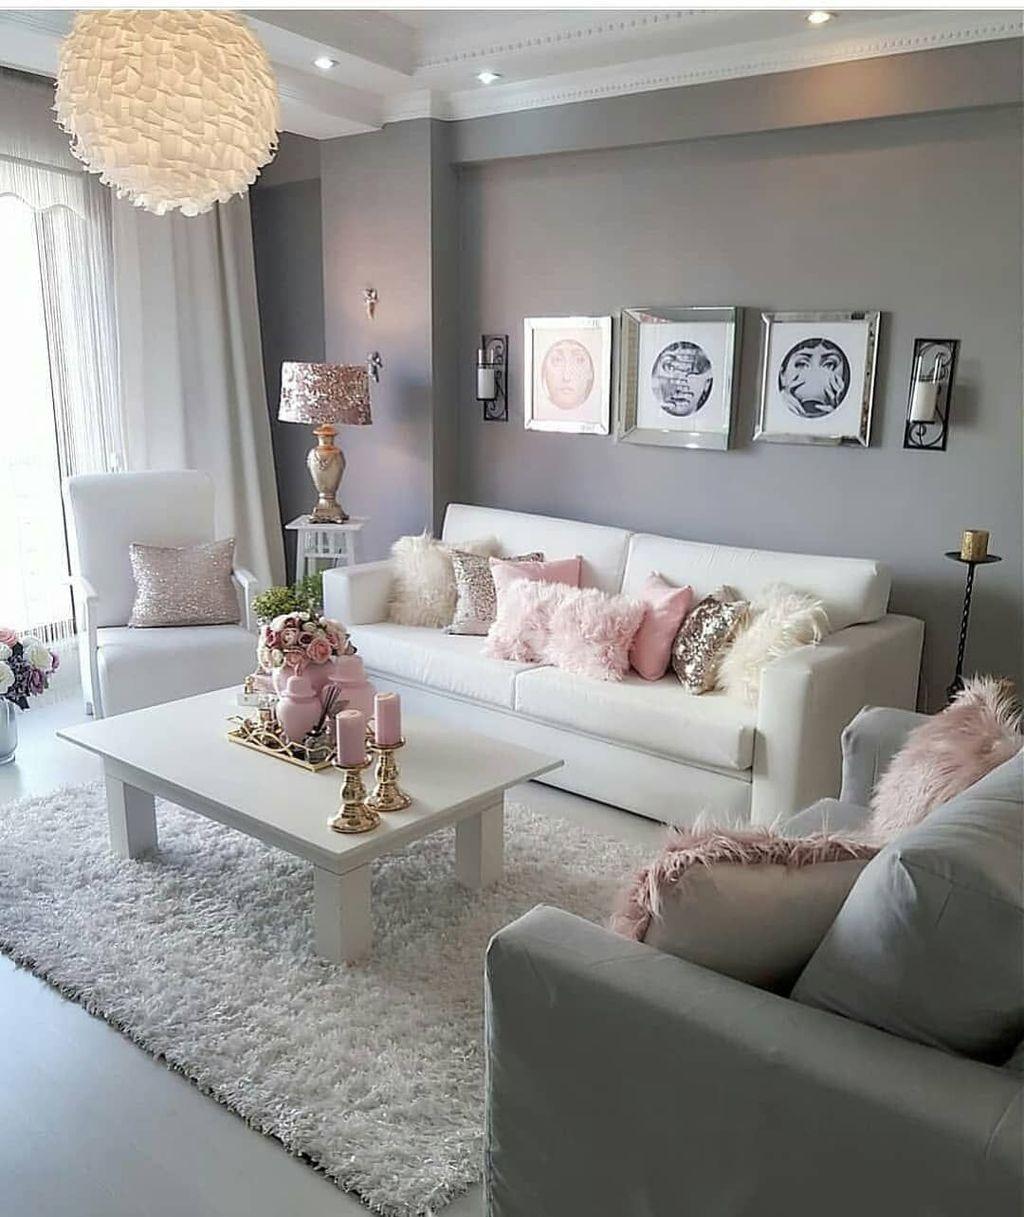 Adorable 53 Cozy And Romantic Living Room Ideas On A Budget Https Freshoom Com 9138 53 Cozy Romantic Glam Living Room Living Room Designs Living Room Decor